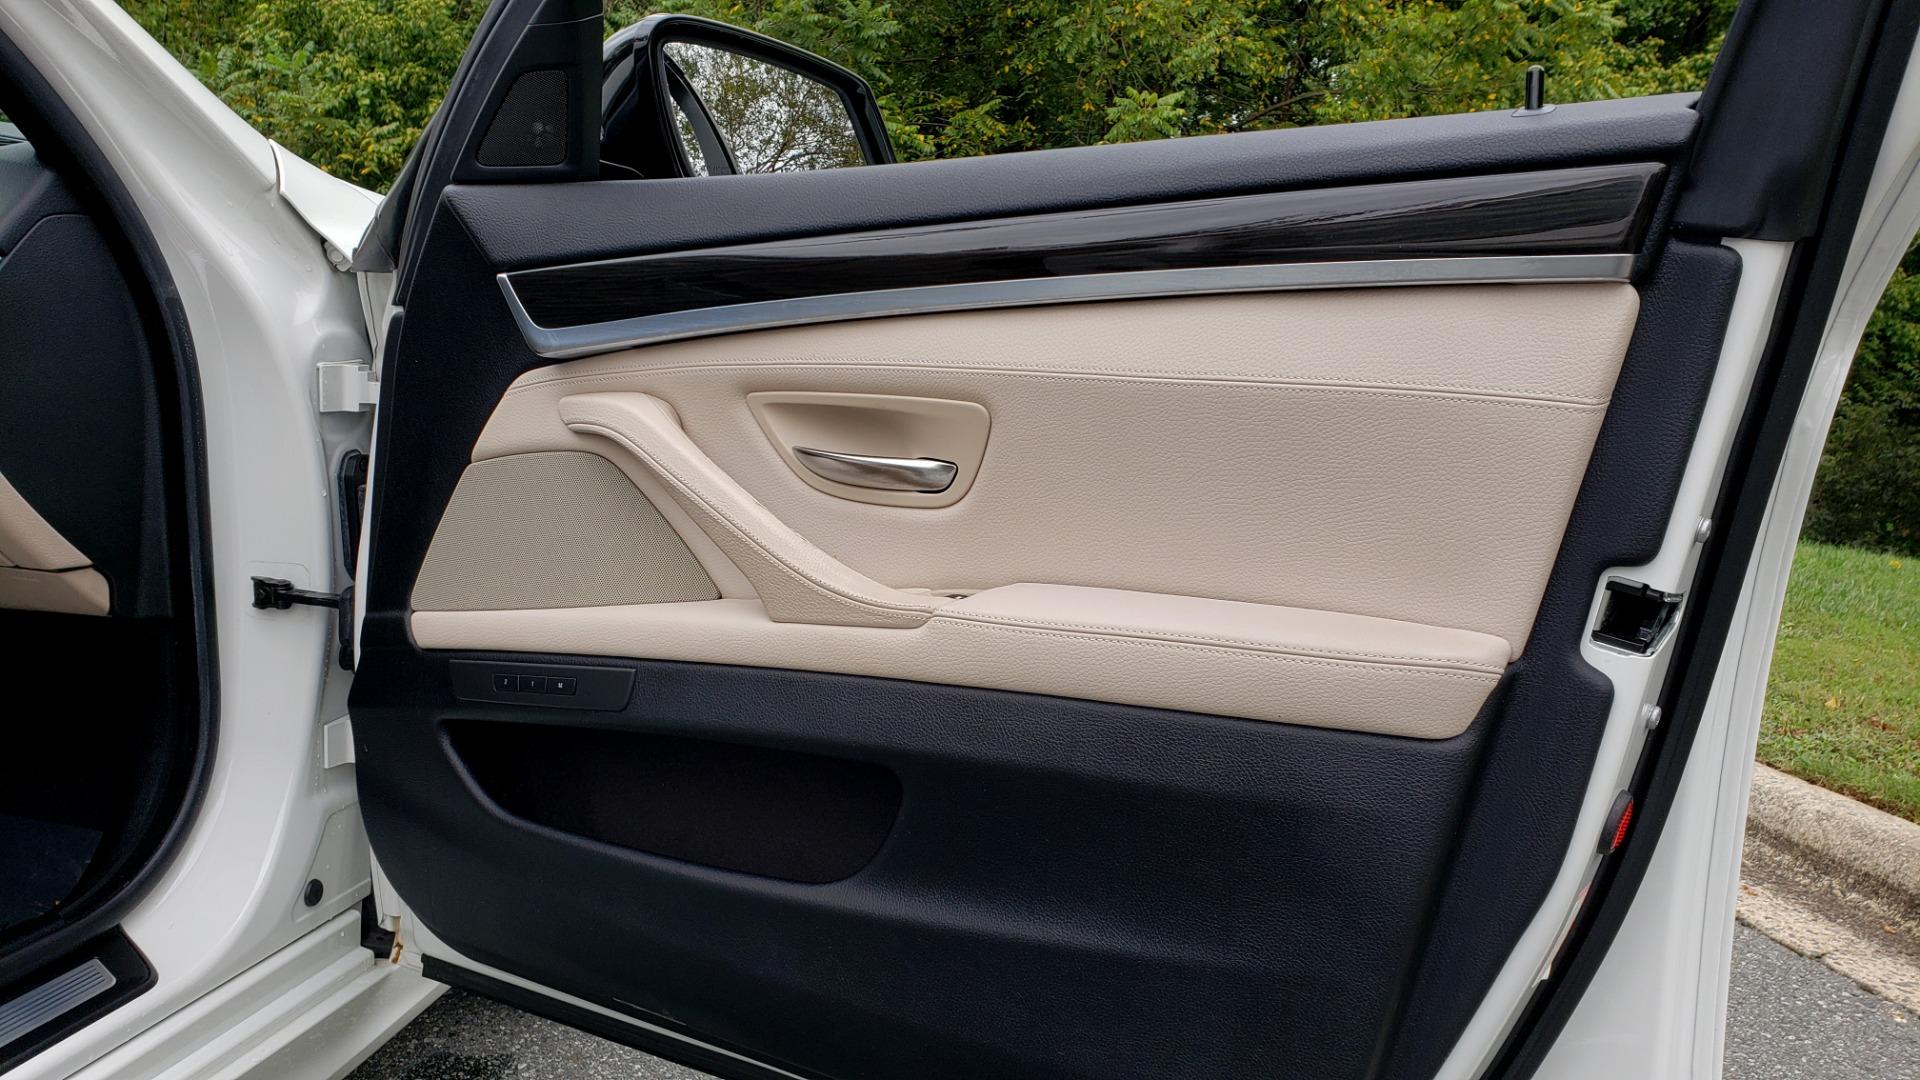 Used 2012 BMW 5 SERIES 550I M SPORT / NAV / CONV PKG / SUNROOF / PREM SND / REARVIEW for sale Sold at Formula Imports in Charlotte NC 28227 54